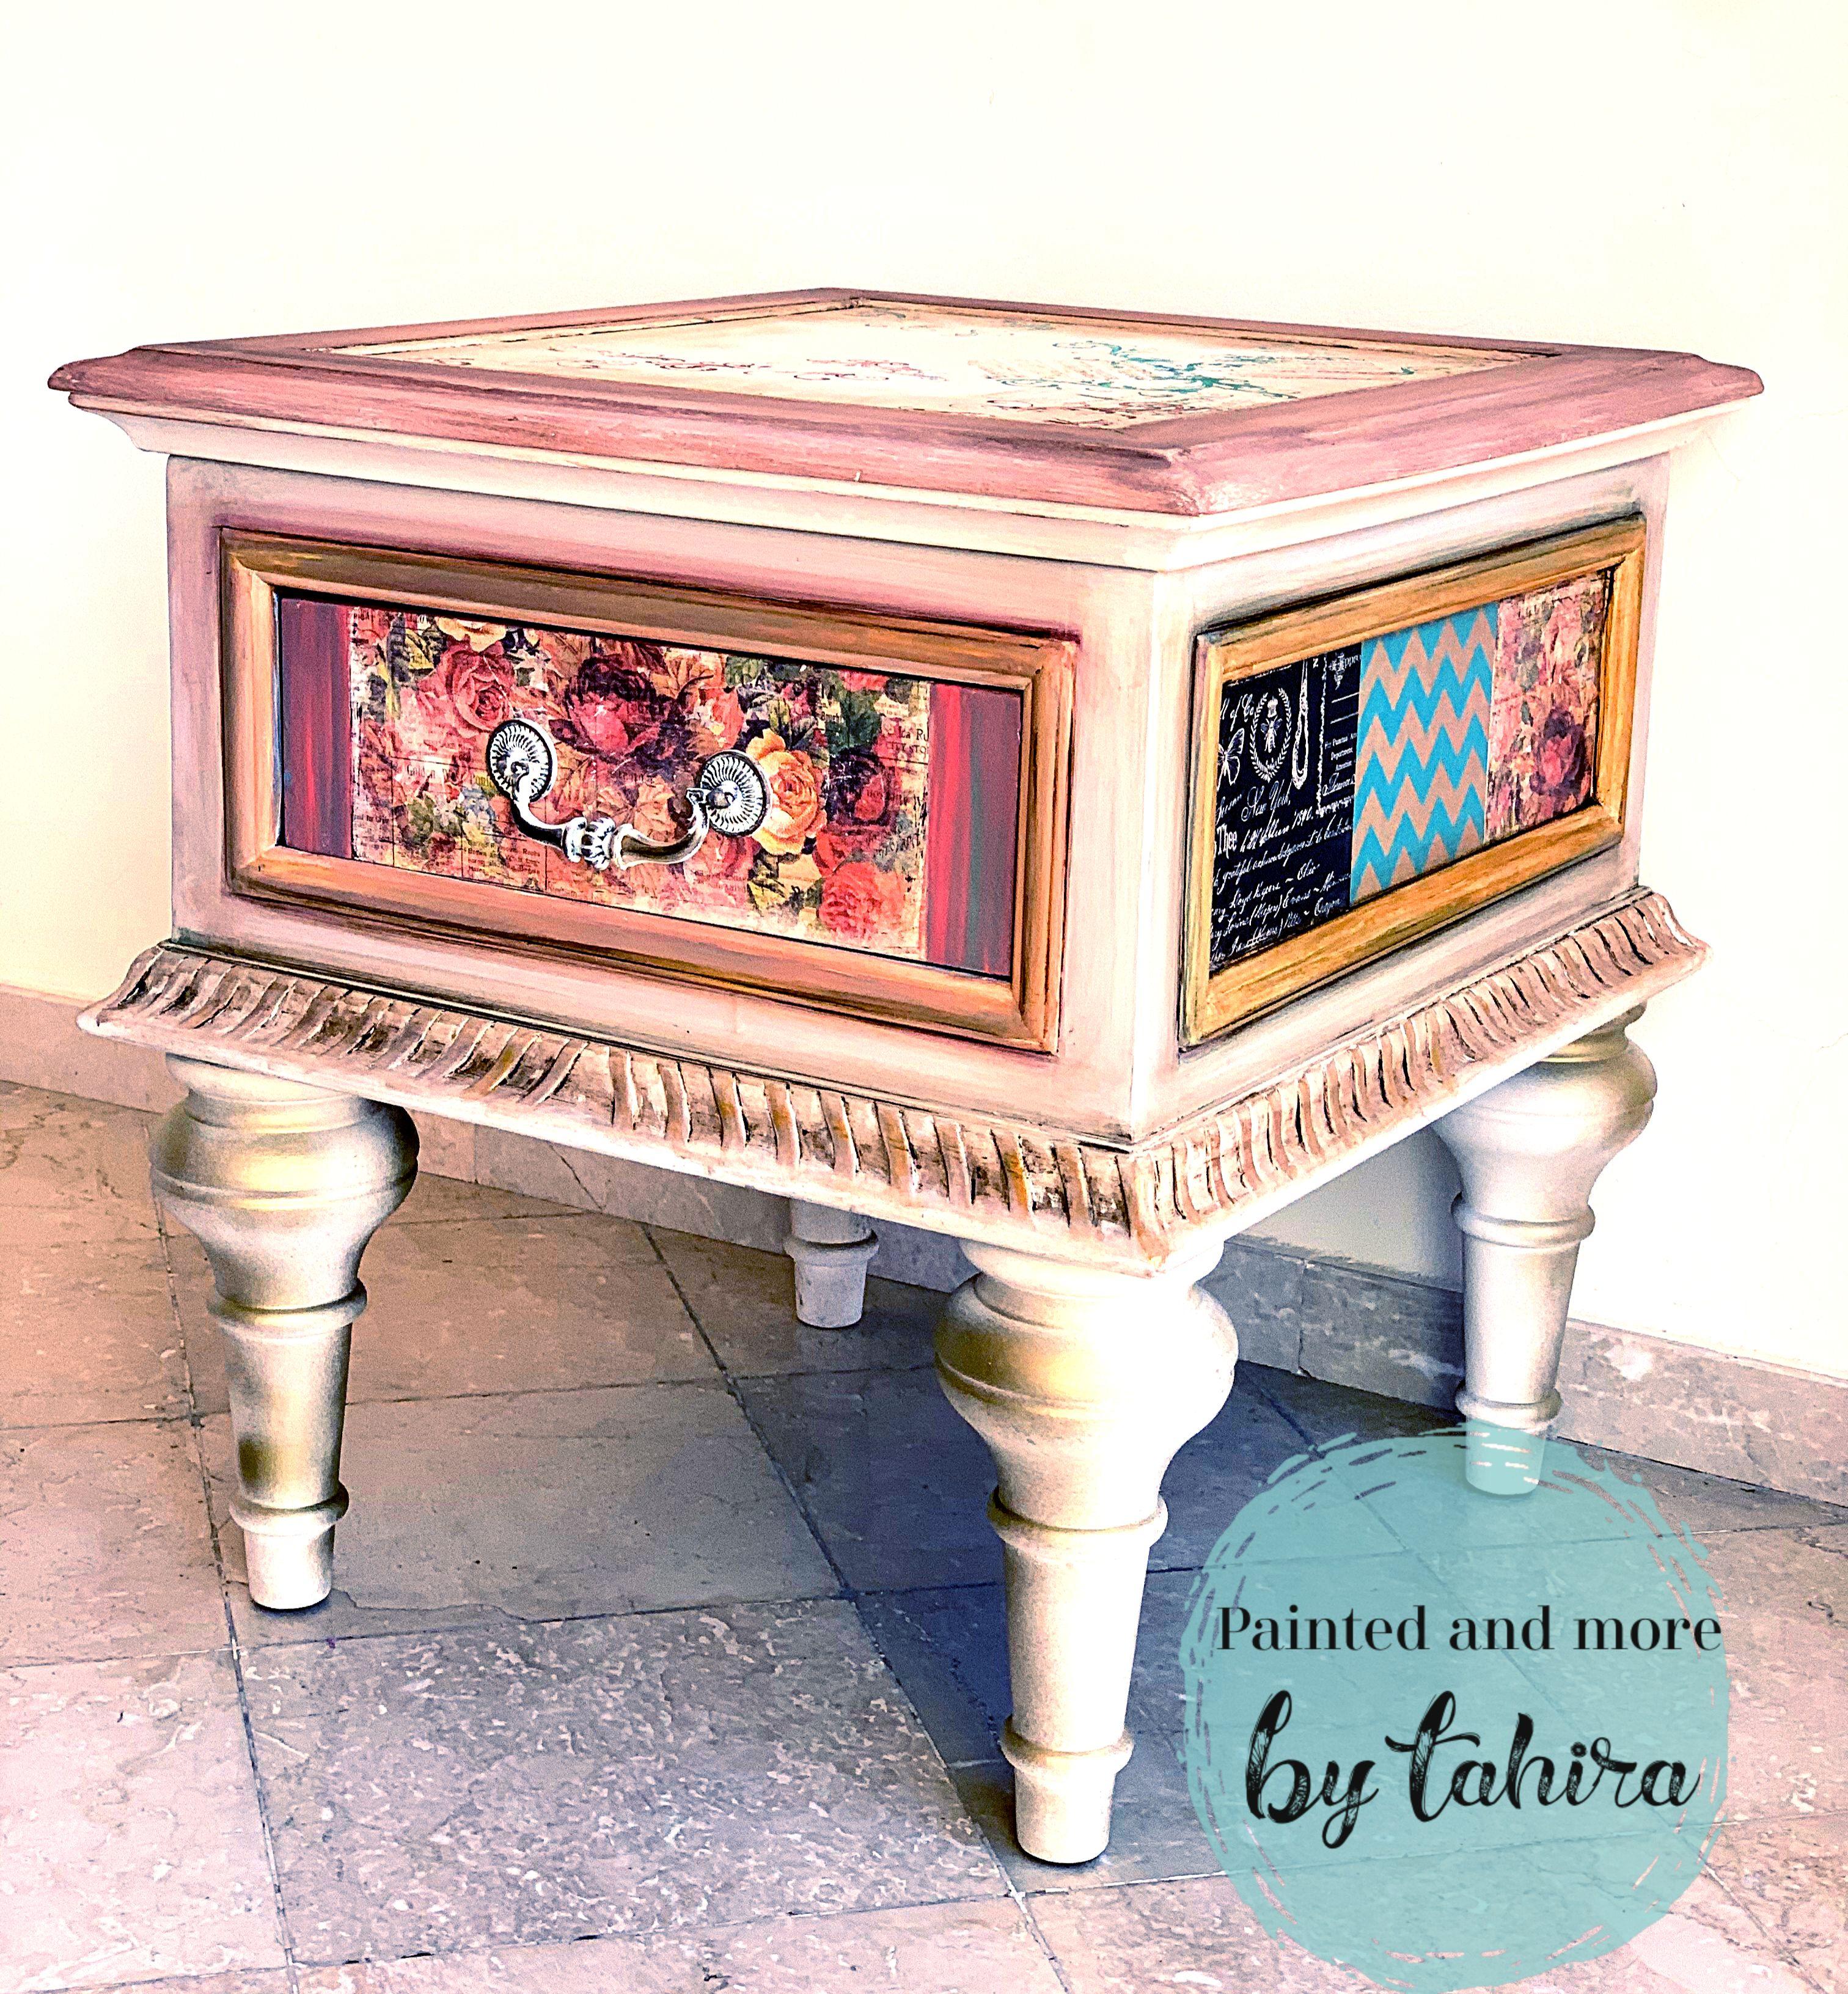 Handpainted and decoupaged table  #paintedandmore #handpainted #tahiraansari #furnitureart #decoupage